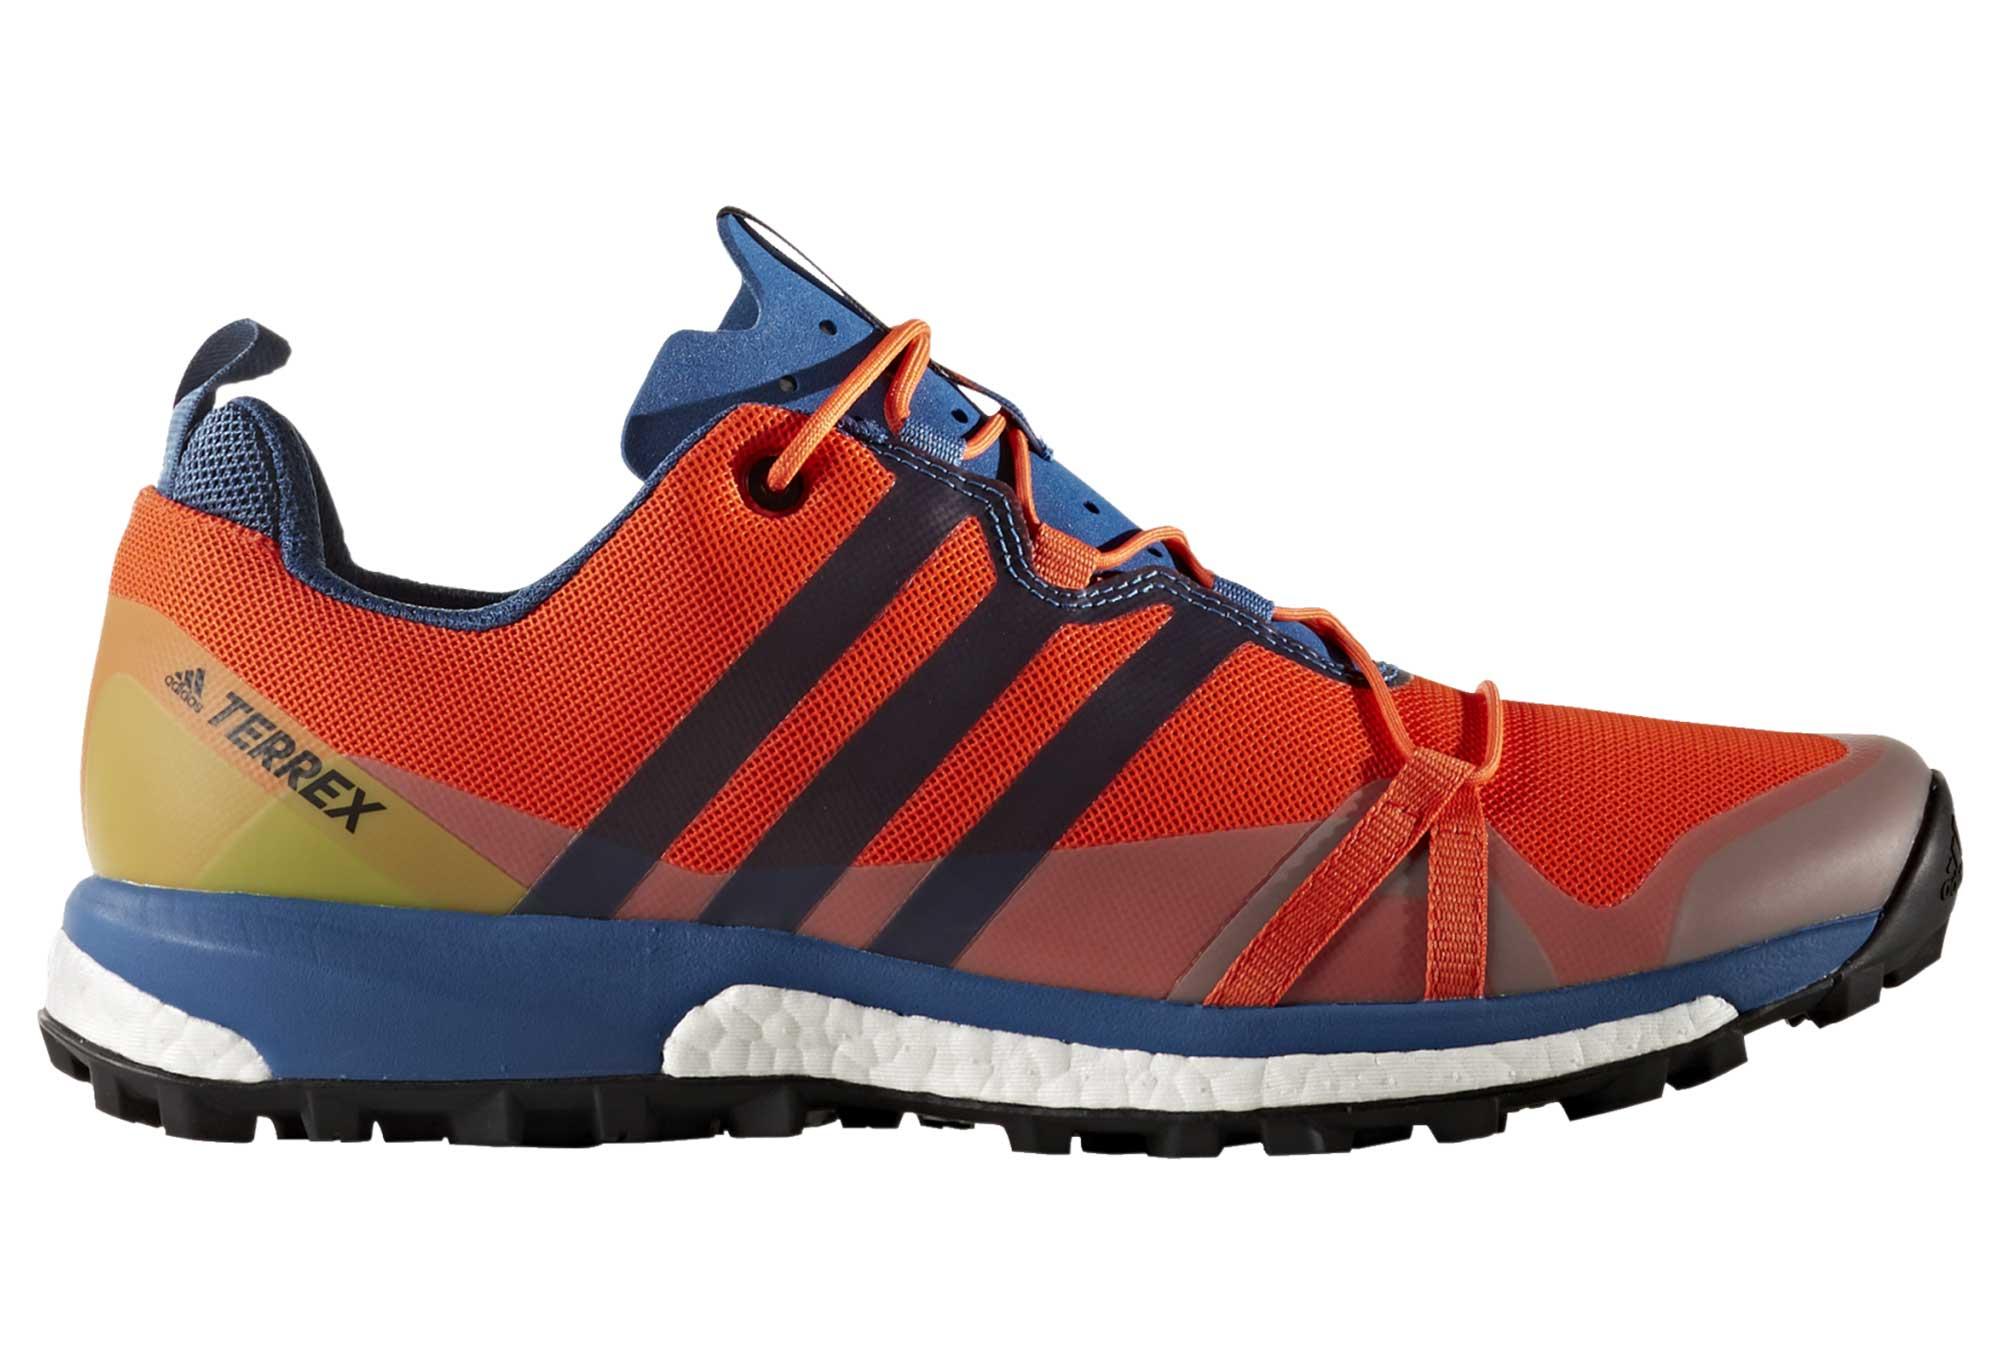 Orange Bleu Homme Terrex Agravic Adidas Running qSGjLzUMVp